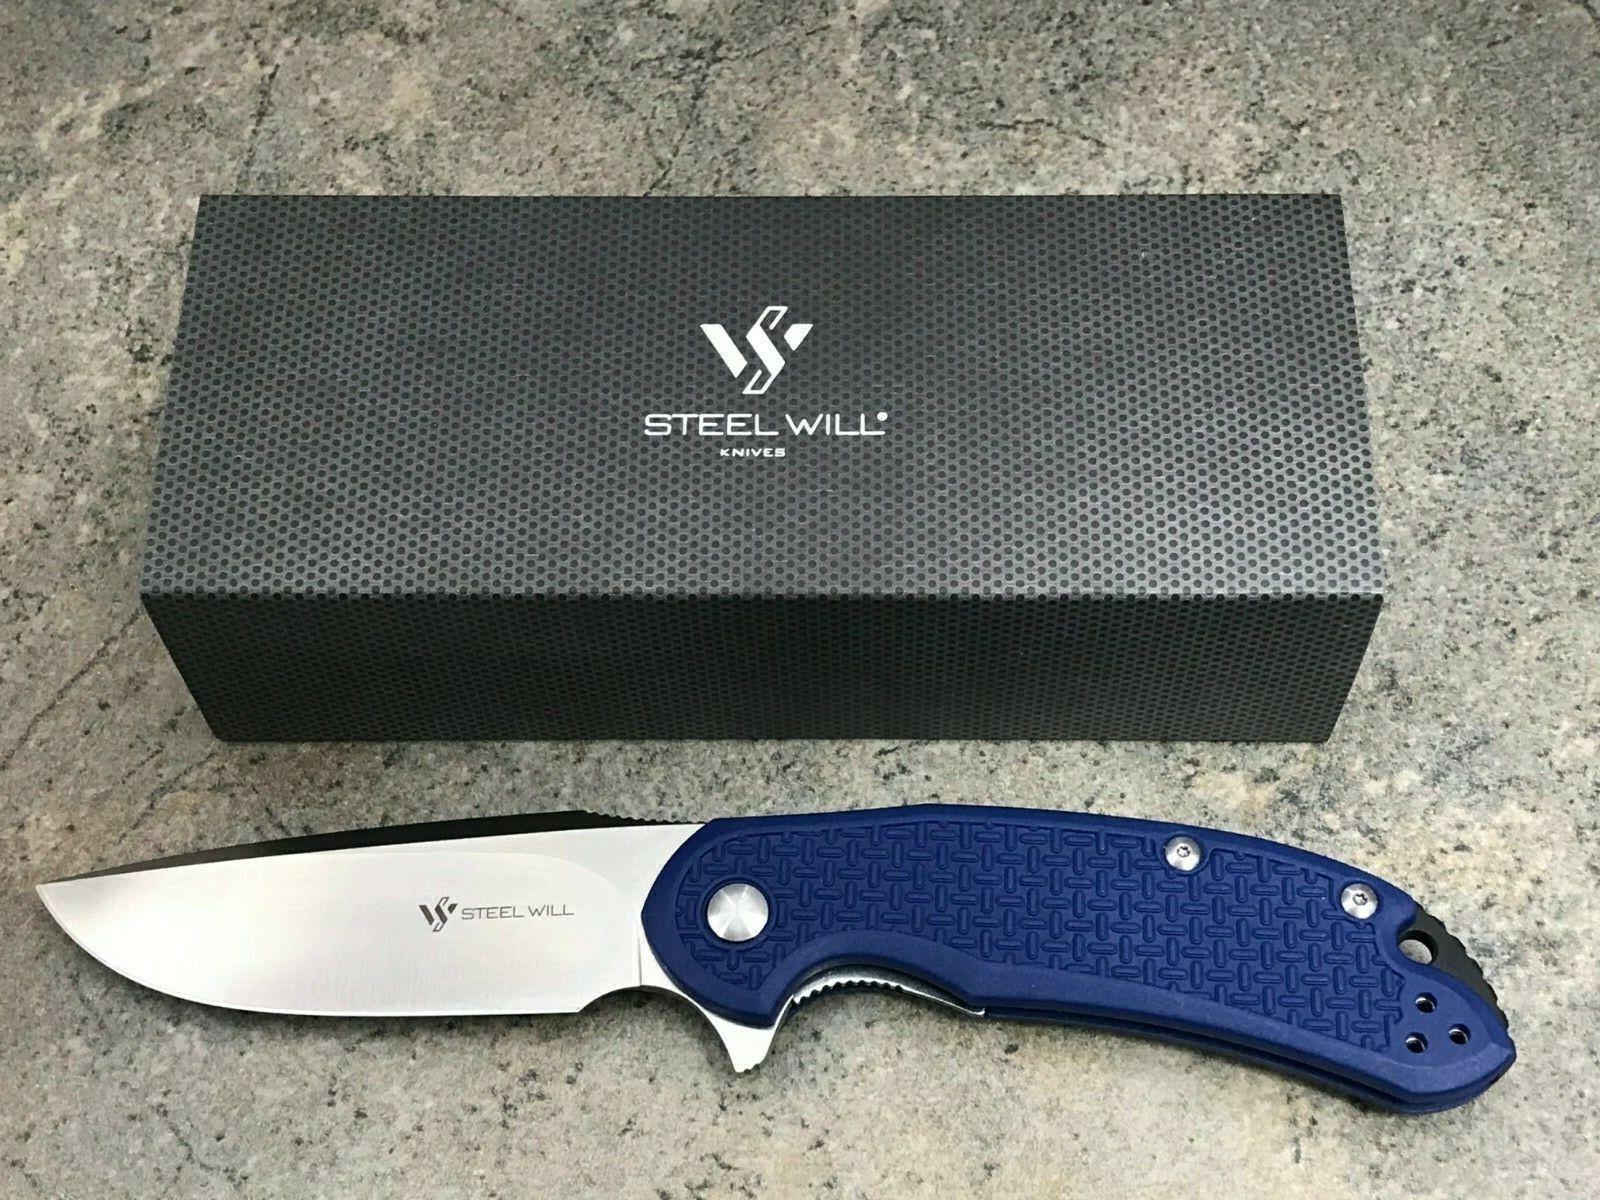 Steel Will Cutjack C22 Folding Knife C22-1BL D2 Steel Blade Linerlock Blue